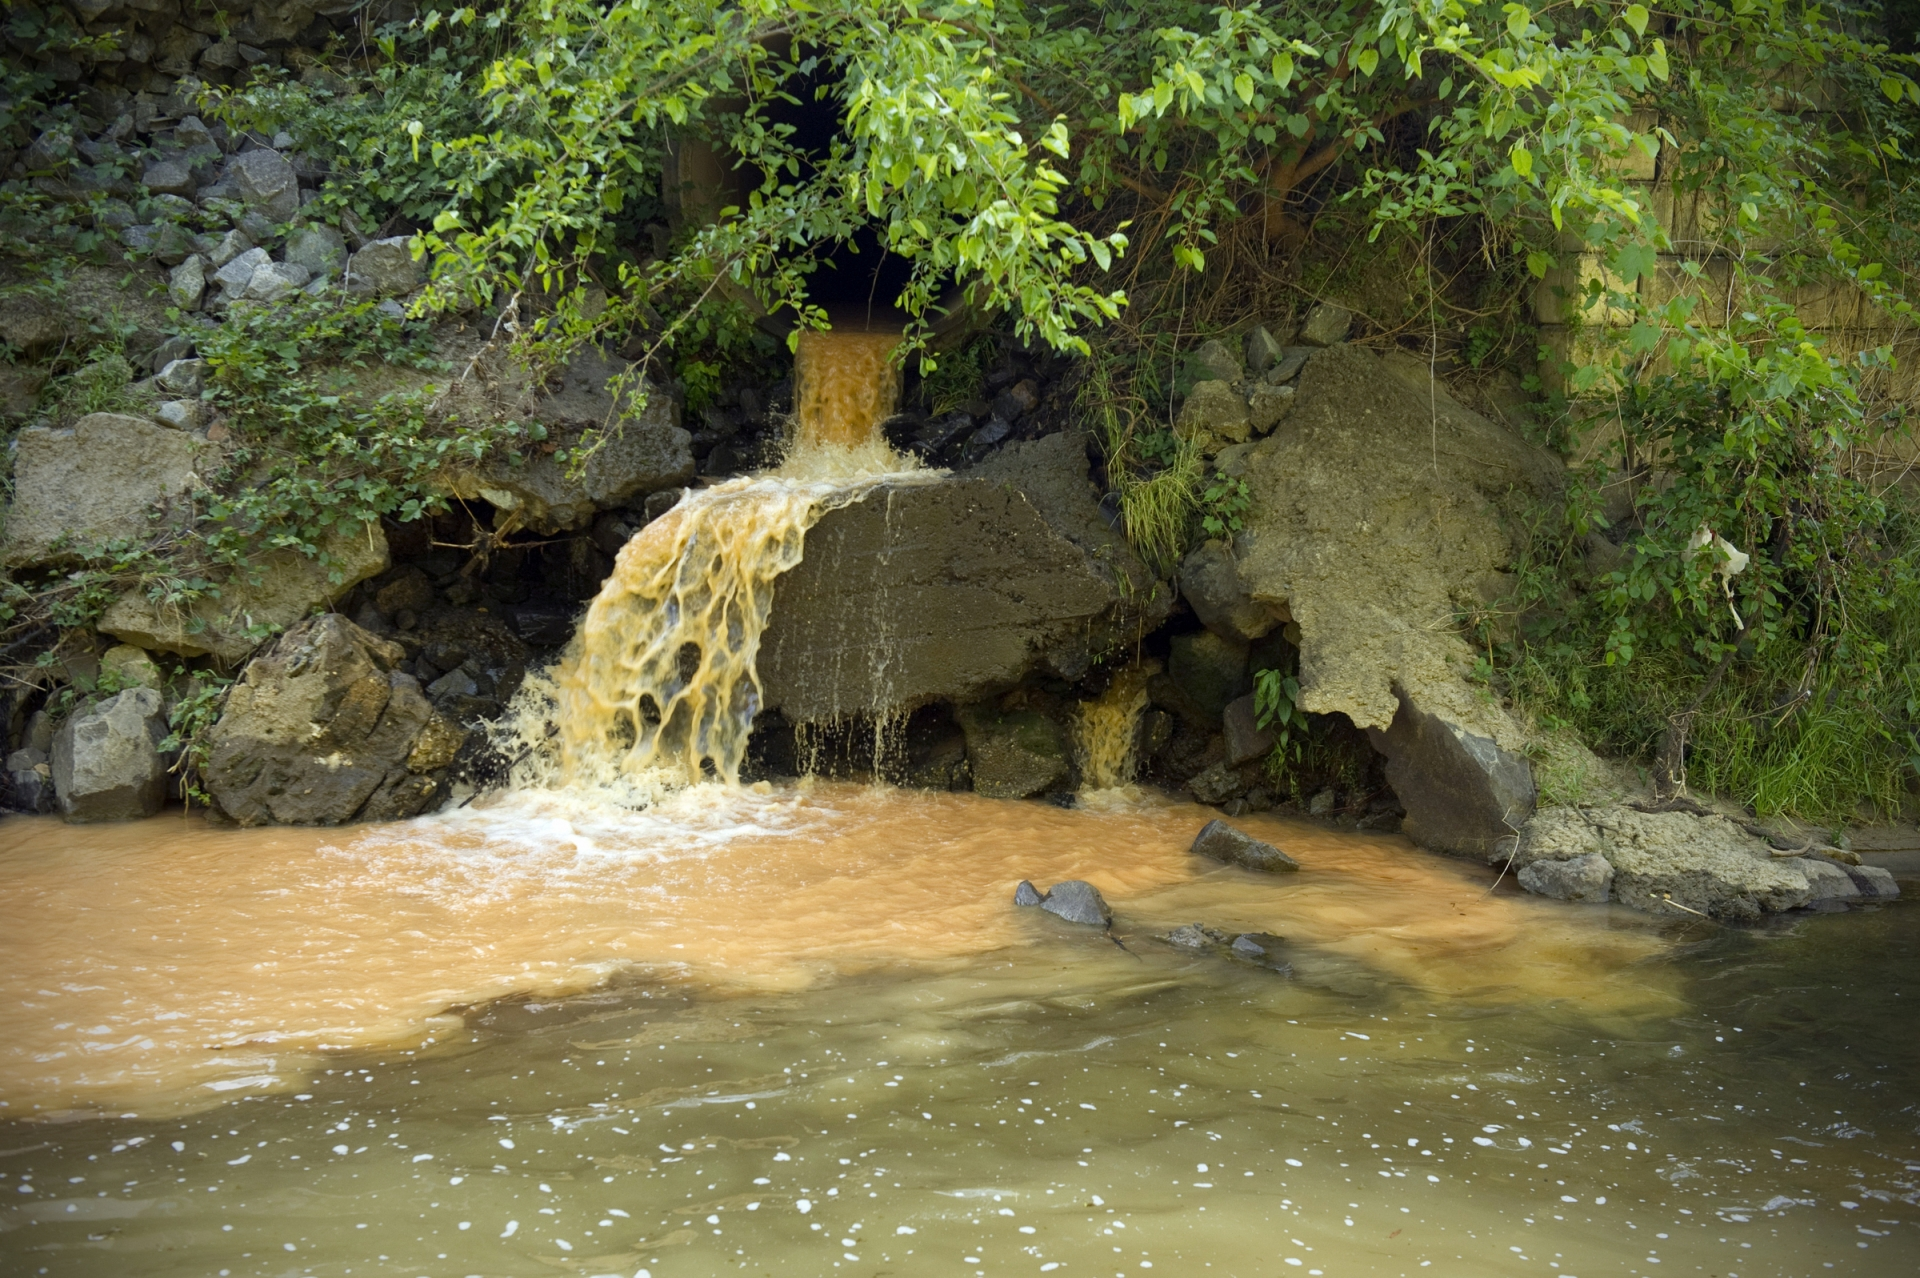 Sedimentation from construction flows into Little Sugar Creek near Carolinas Medical Center on May 14, 2013. Photo: Nancy Pierce